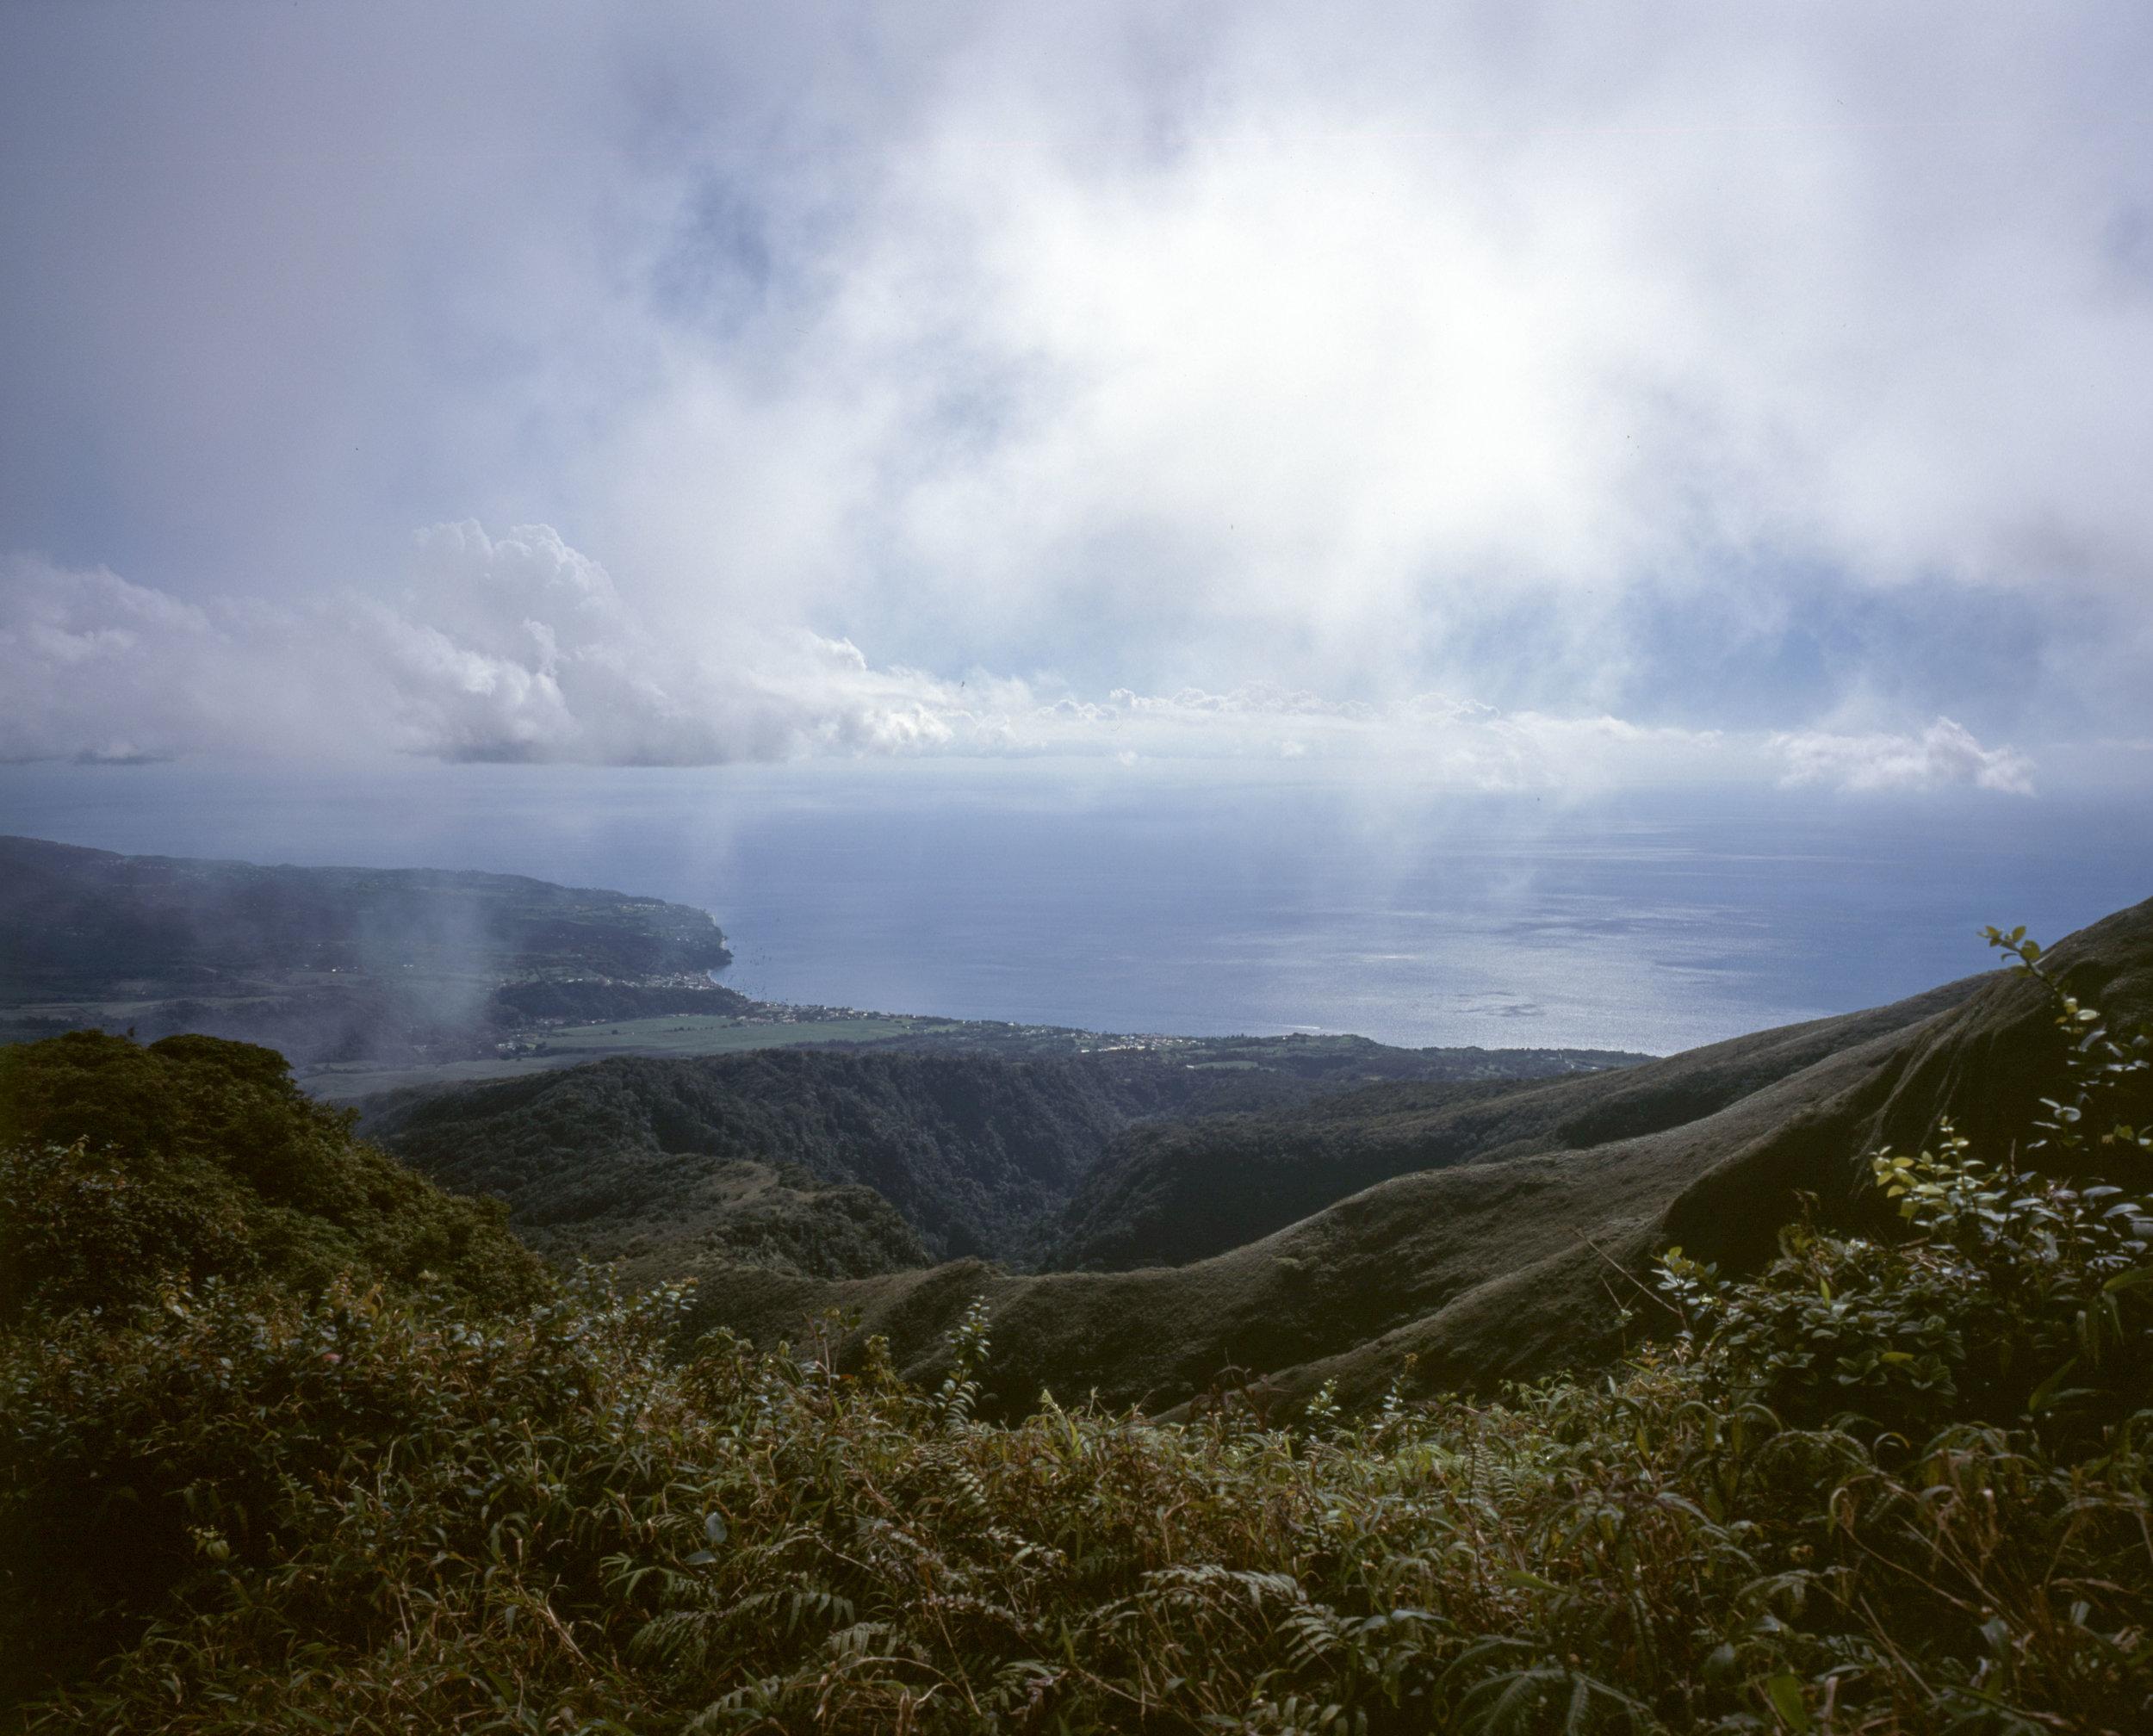 The view up the hike, before we got into the clouds Fuji GF670w | Fuji Provia 100f